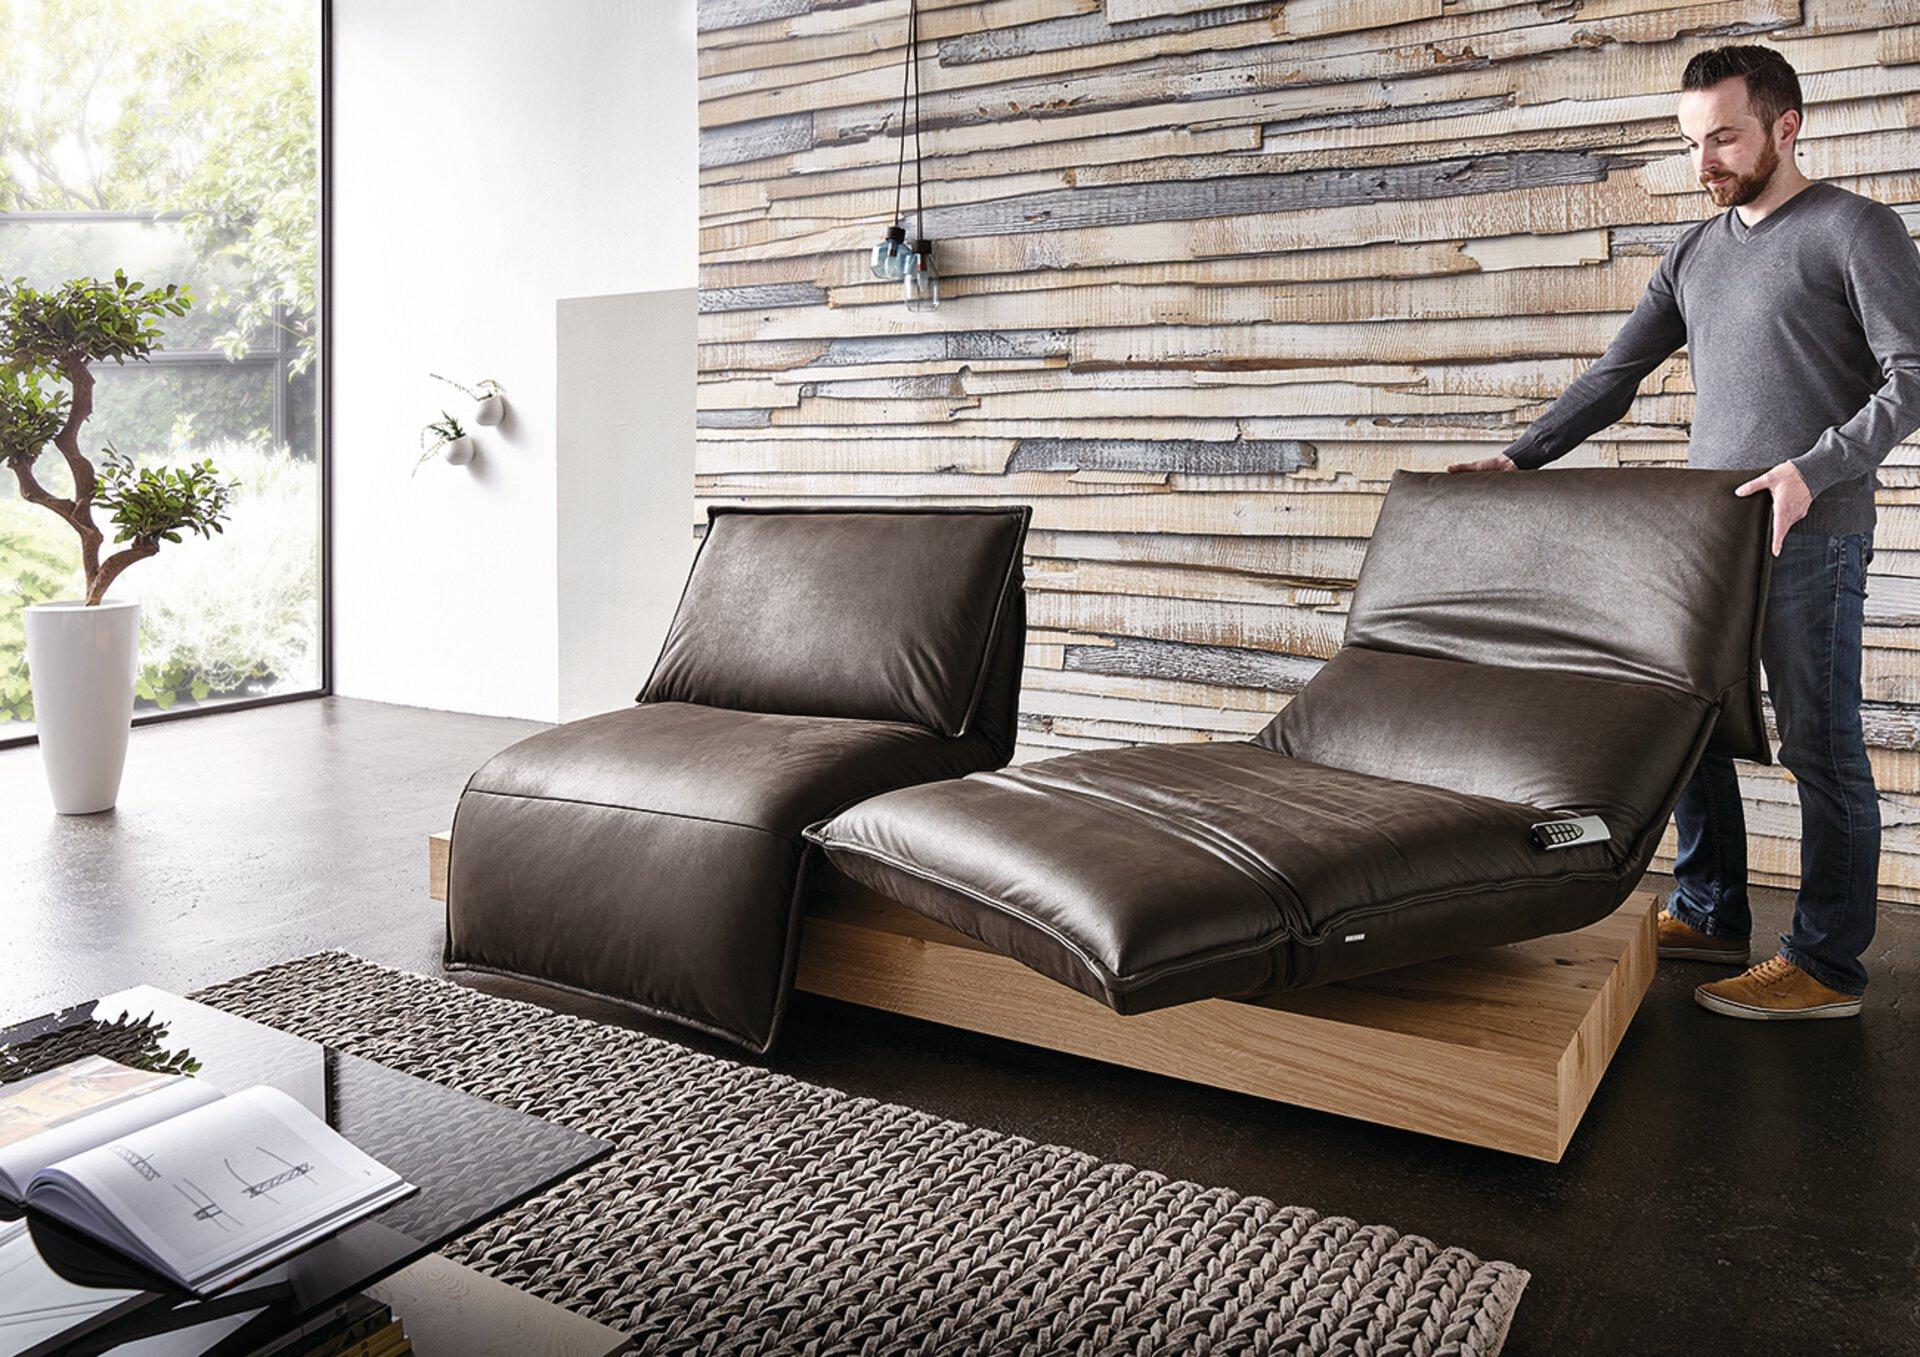 Sofa 2-Sitzer EDIT 3 Koinor Leder braun 115 x 80 x 240 cm